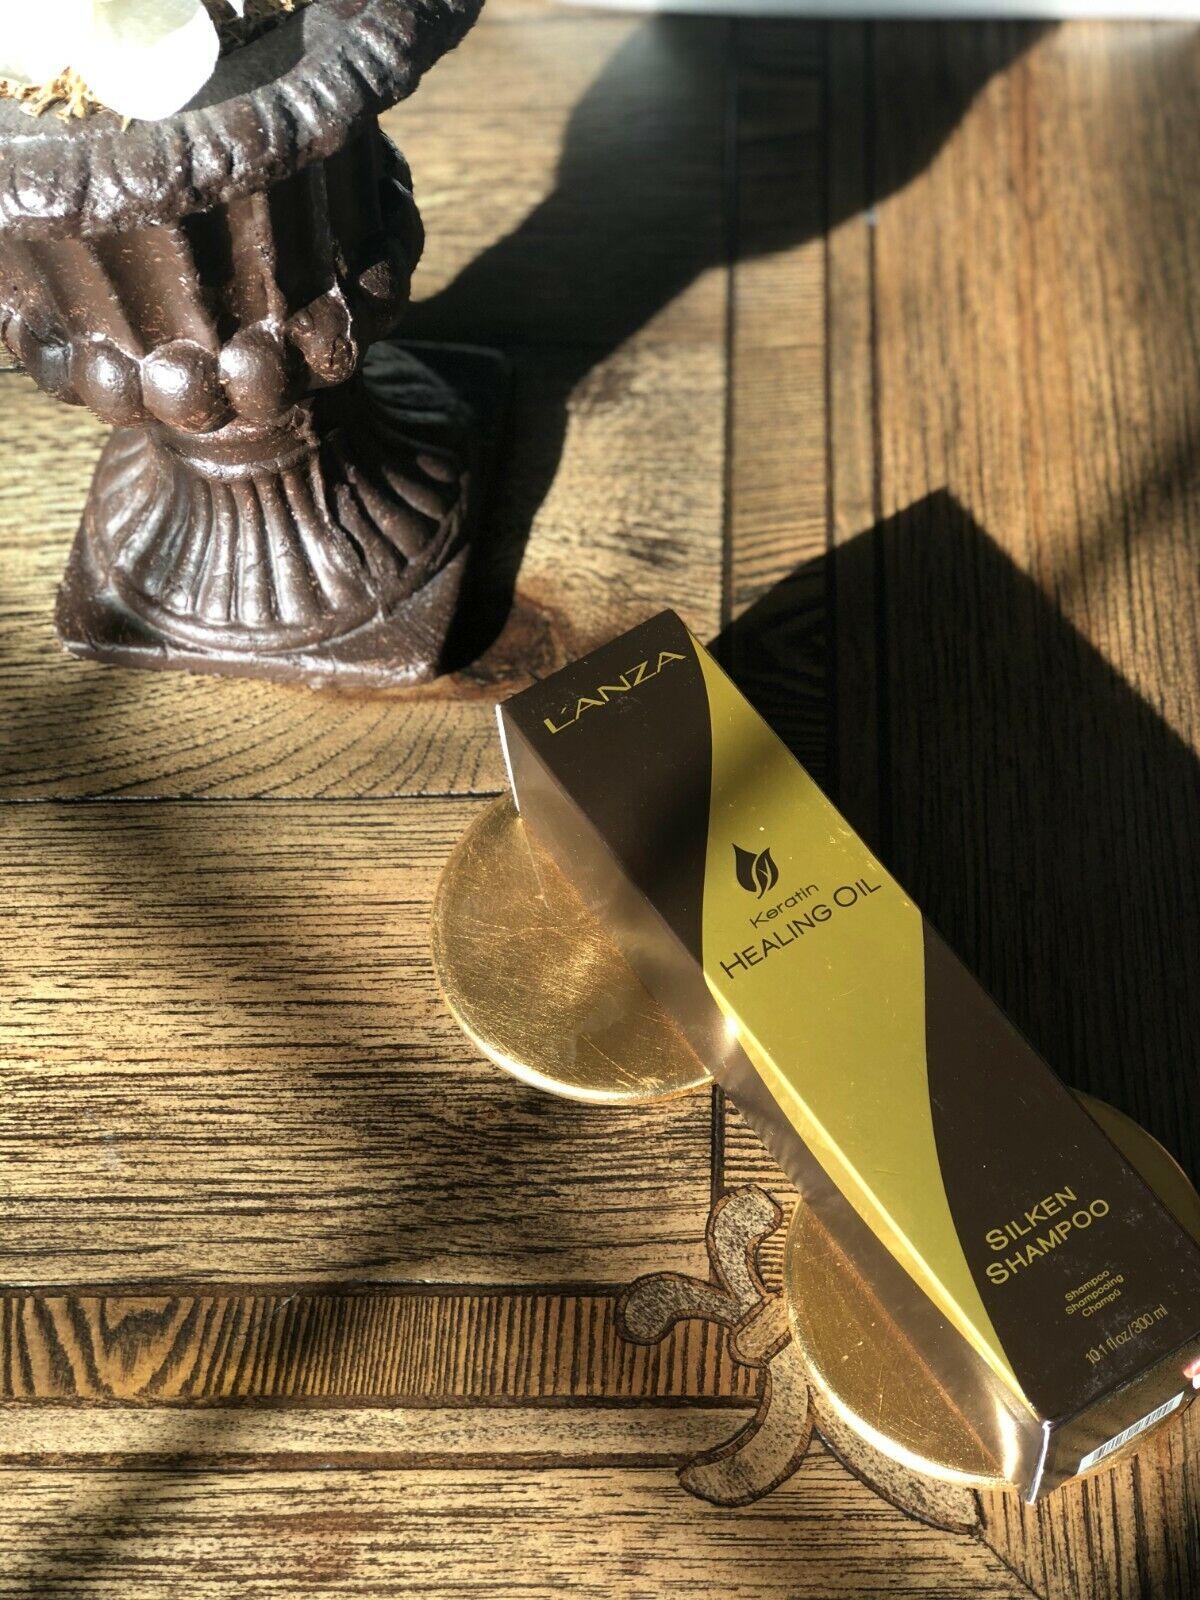 L/'Anza Keratin Healing Oil Aromatherapy Candle 4oz